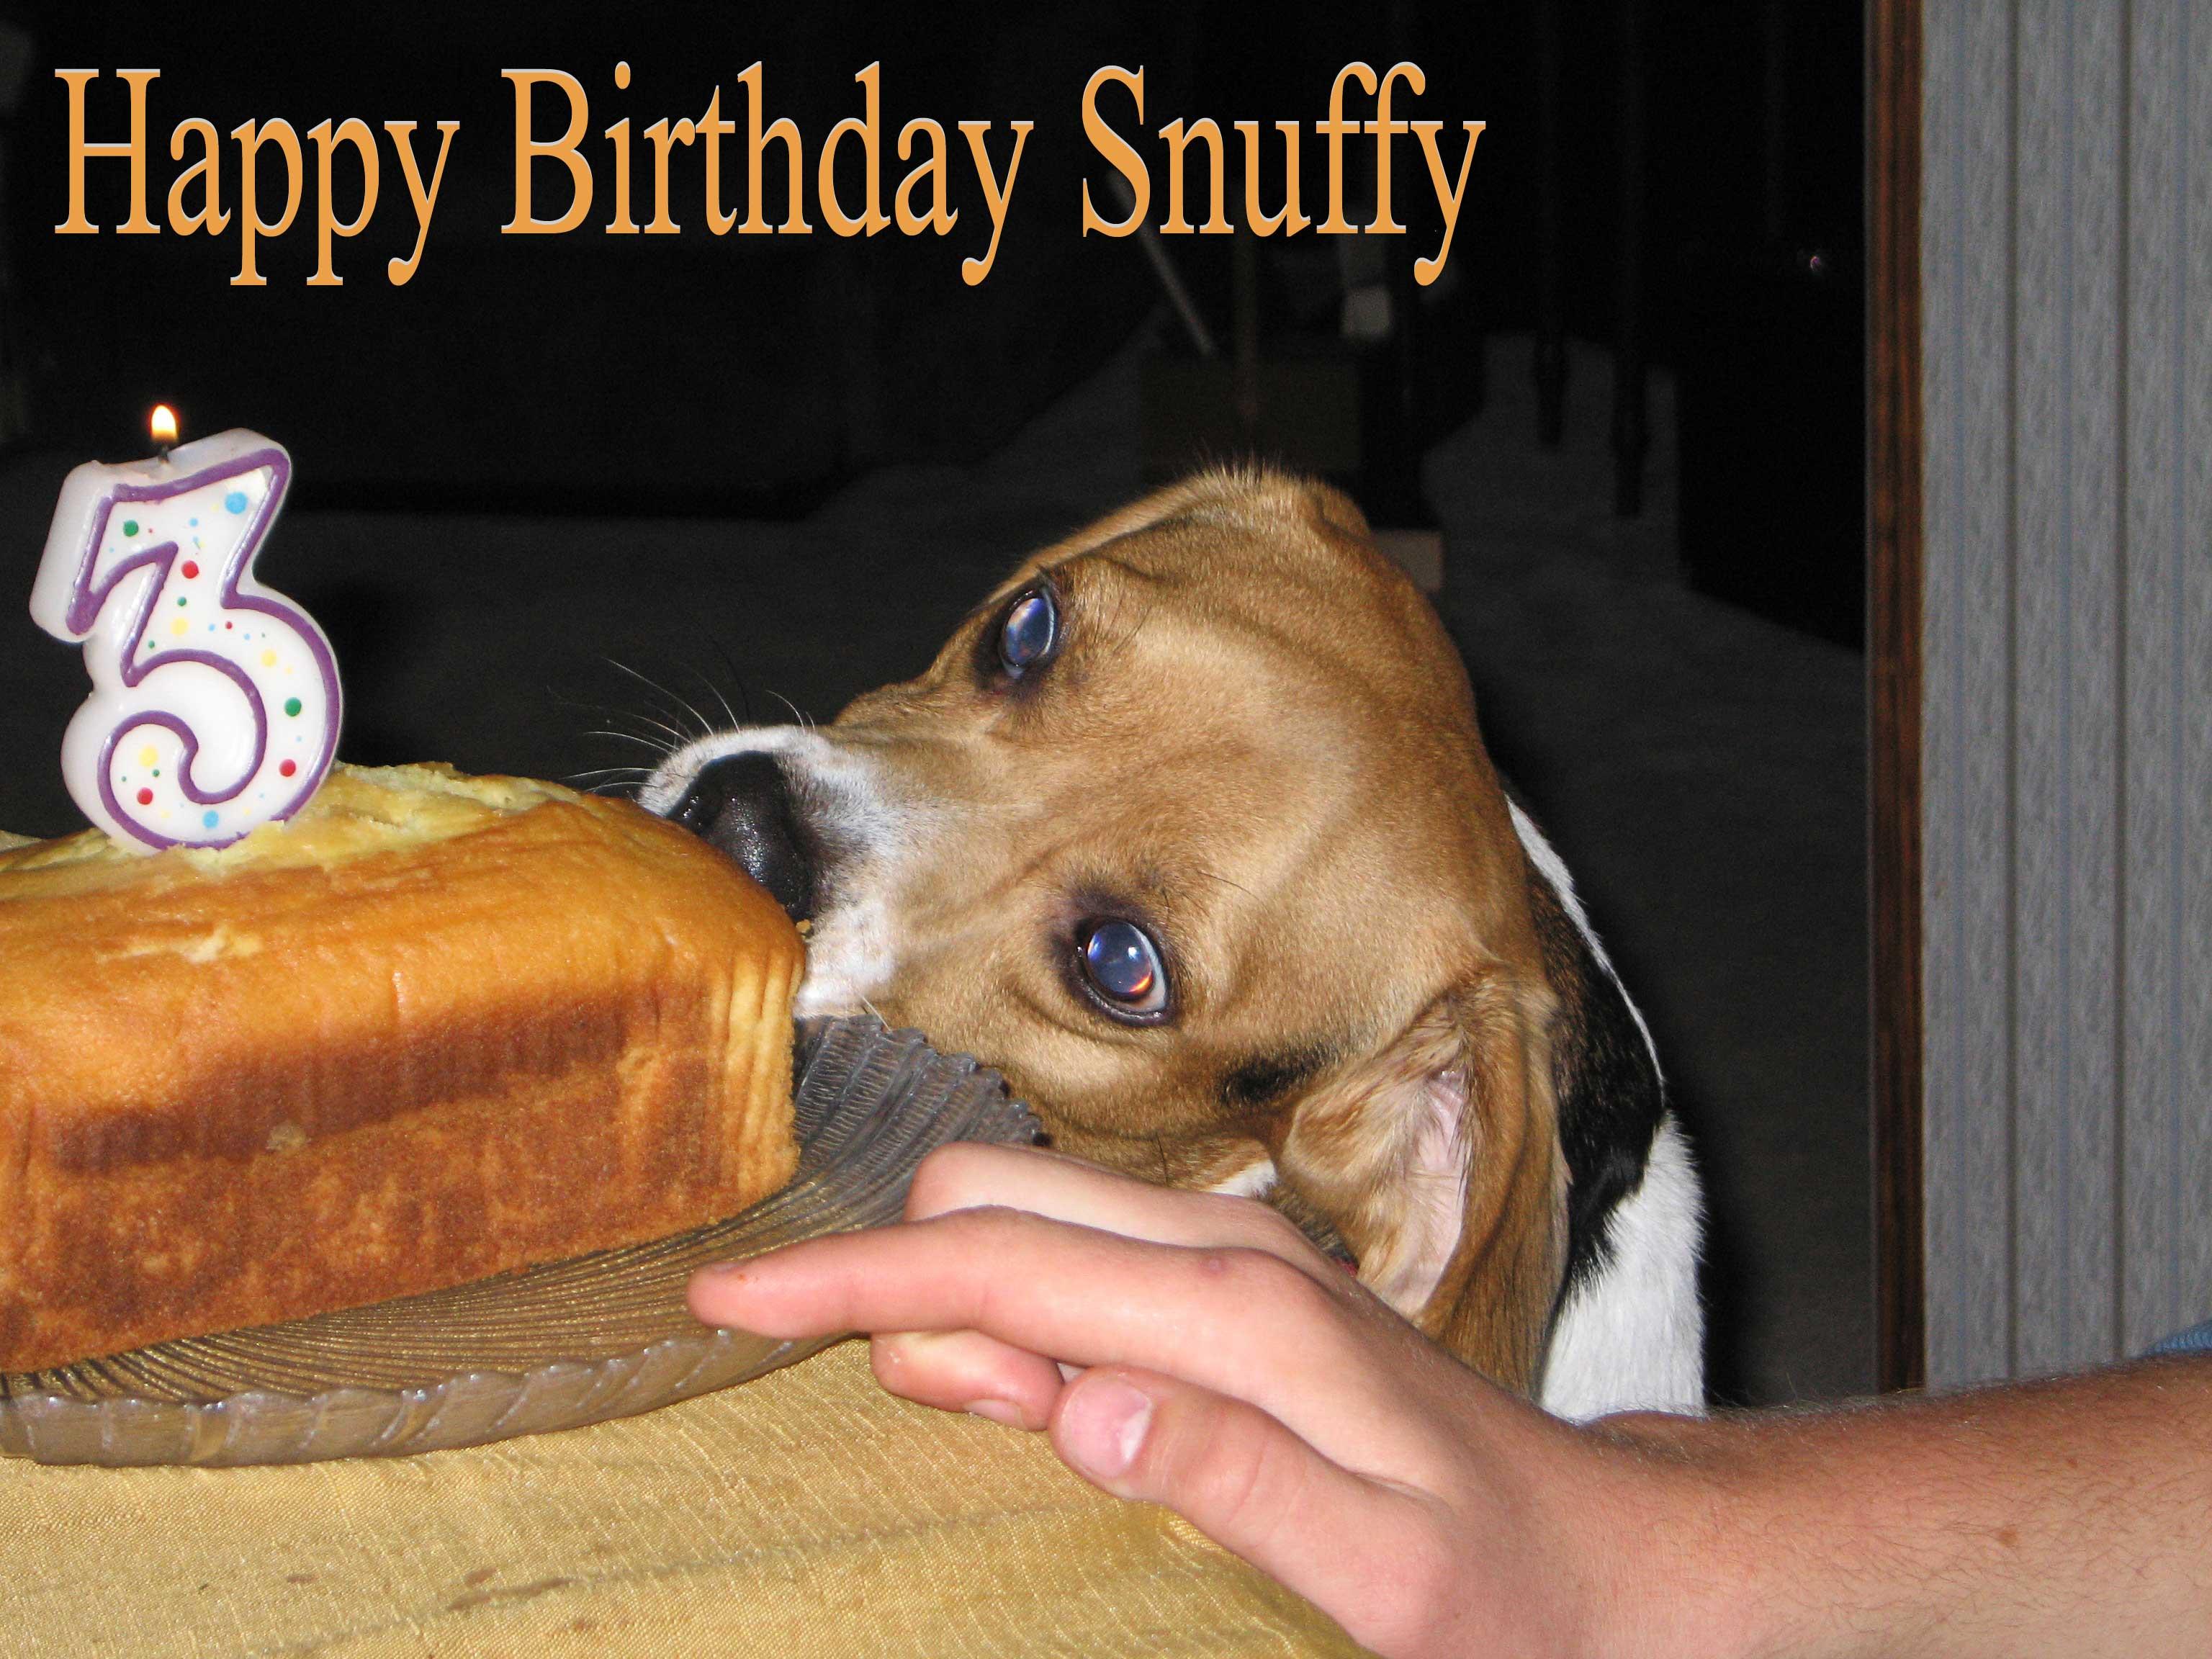 Snuffy's Bithday